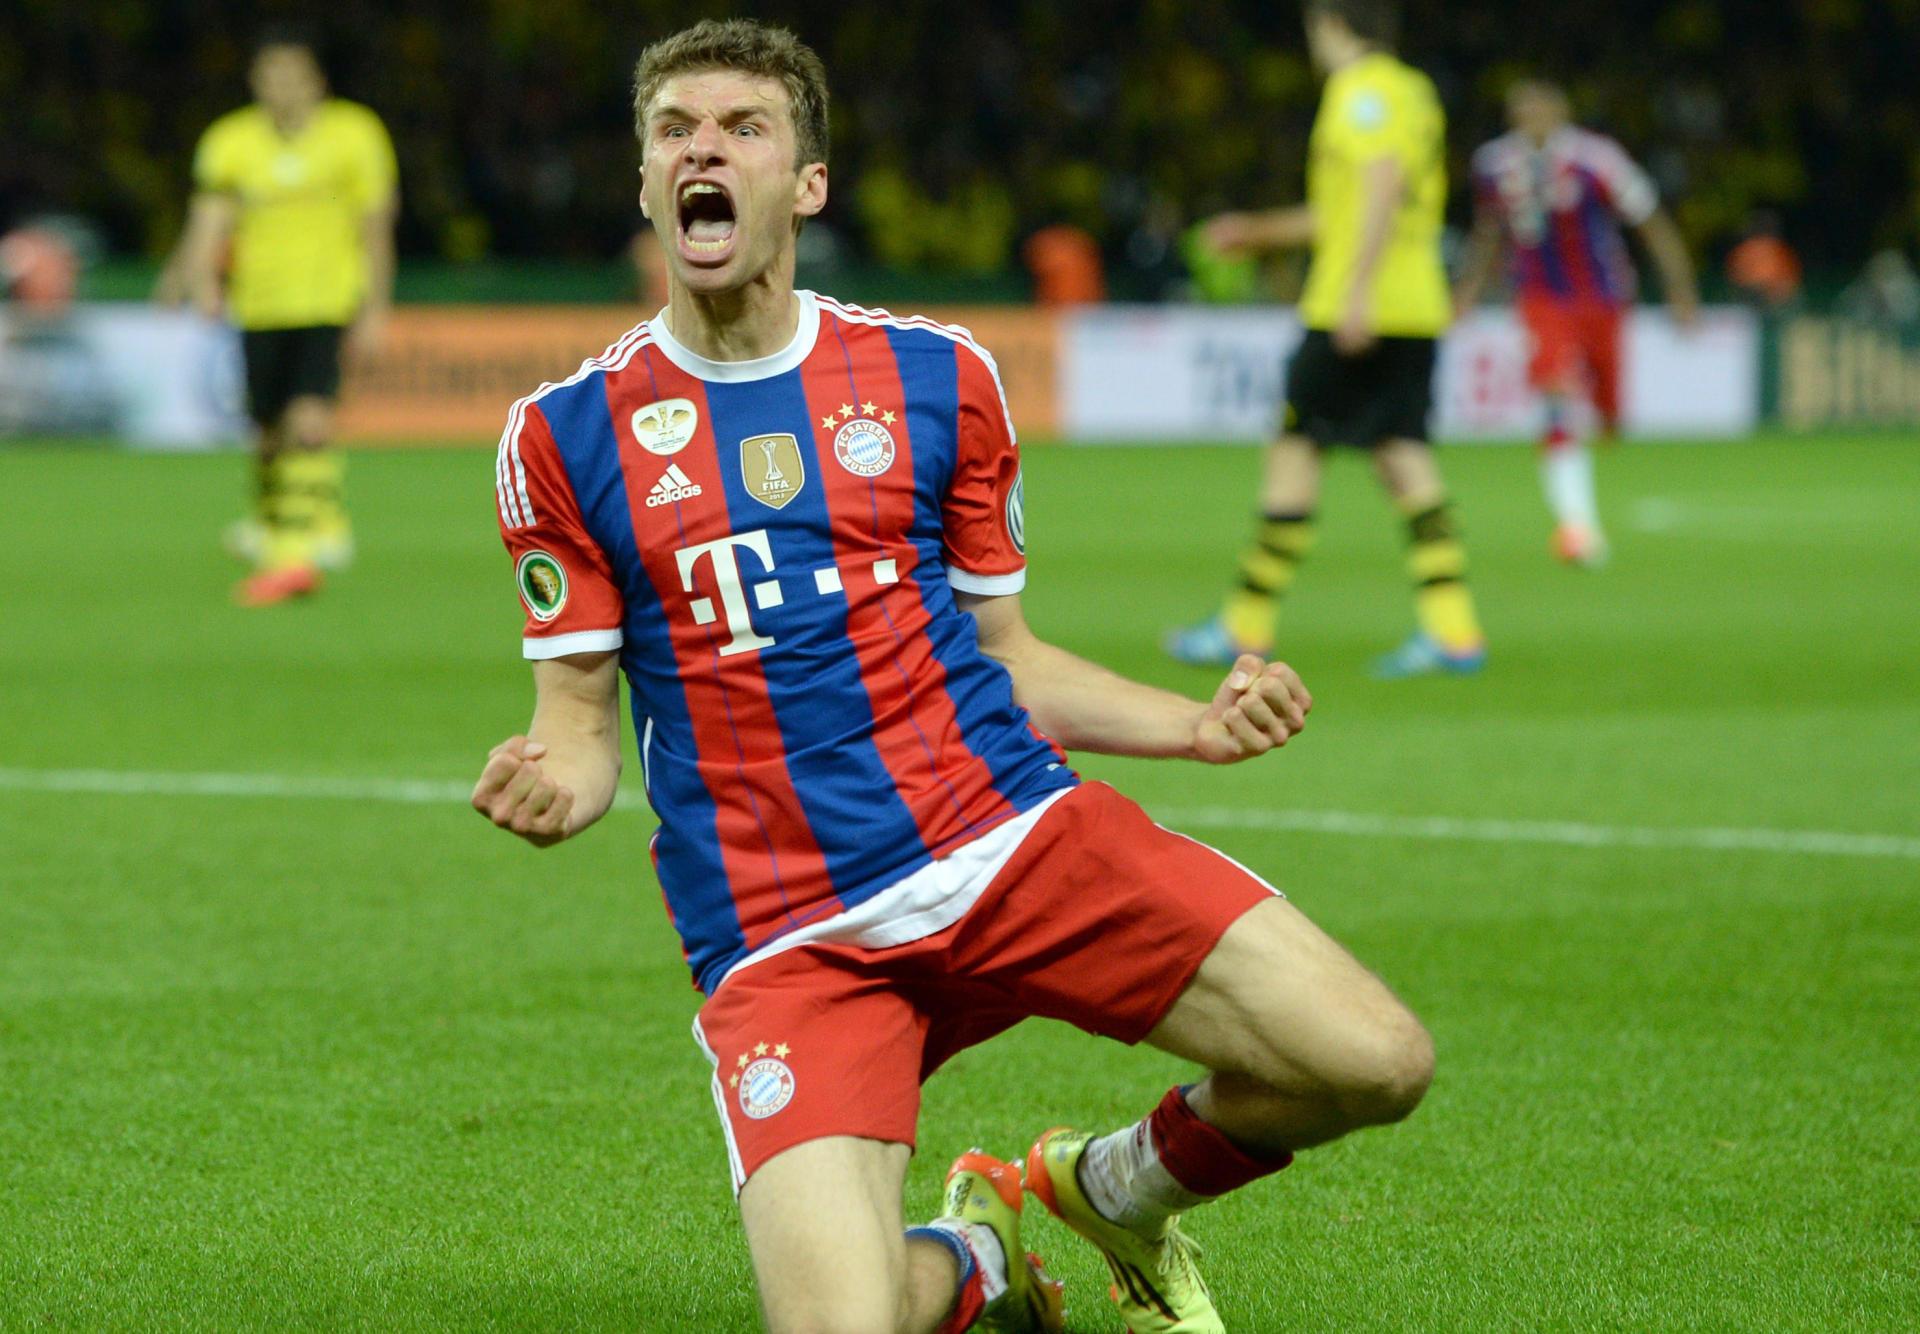 Manchester United is preparing a £60 million bid for Muller